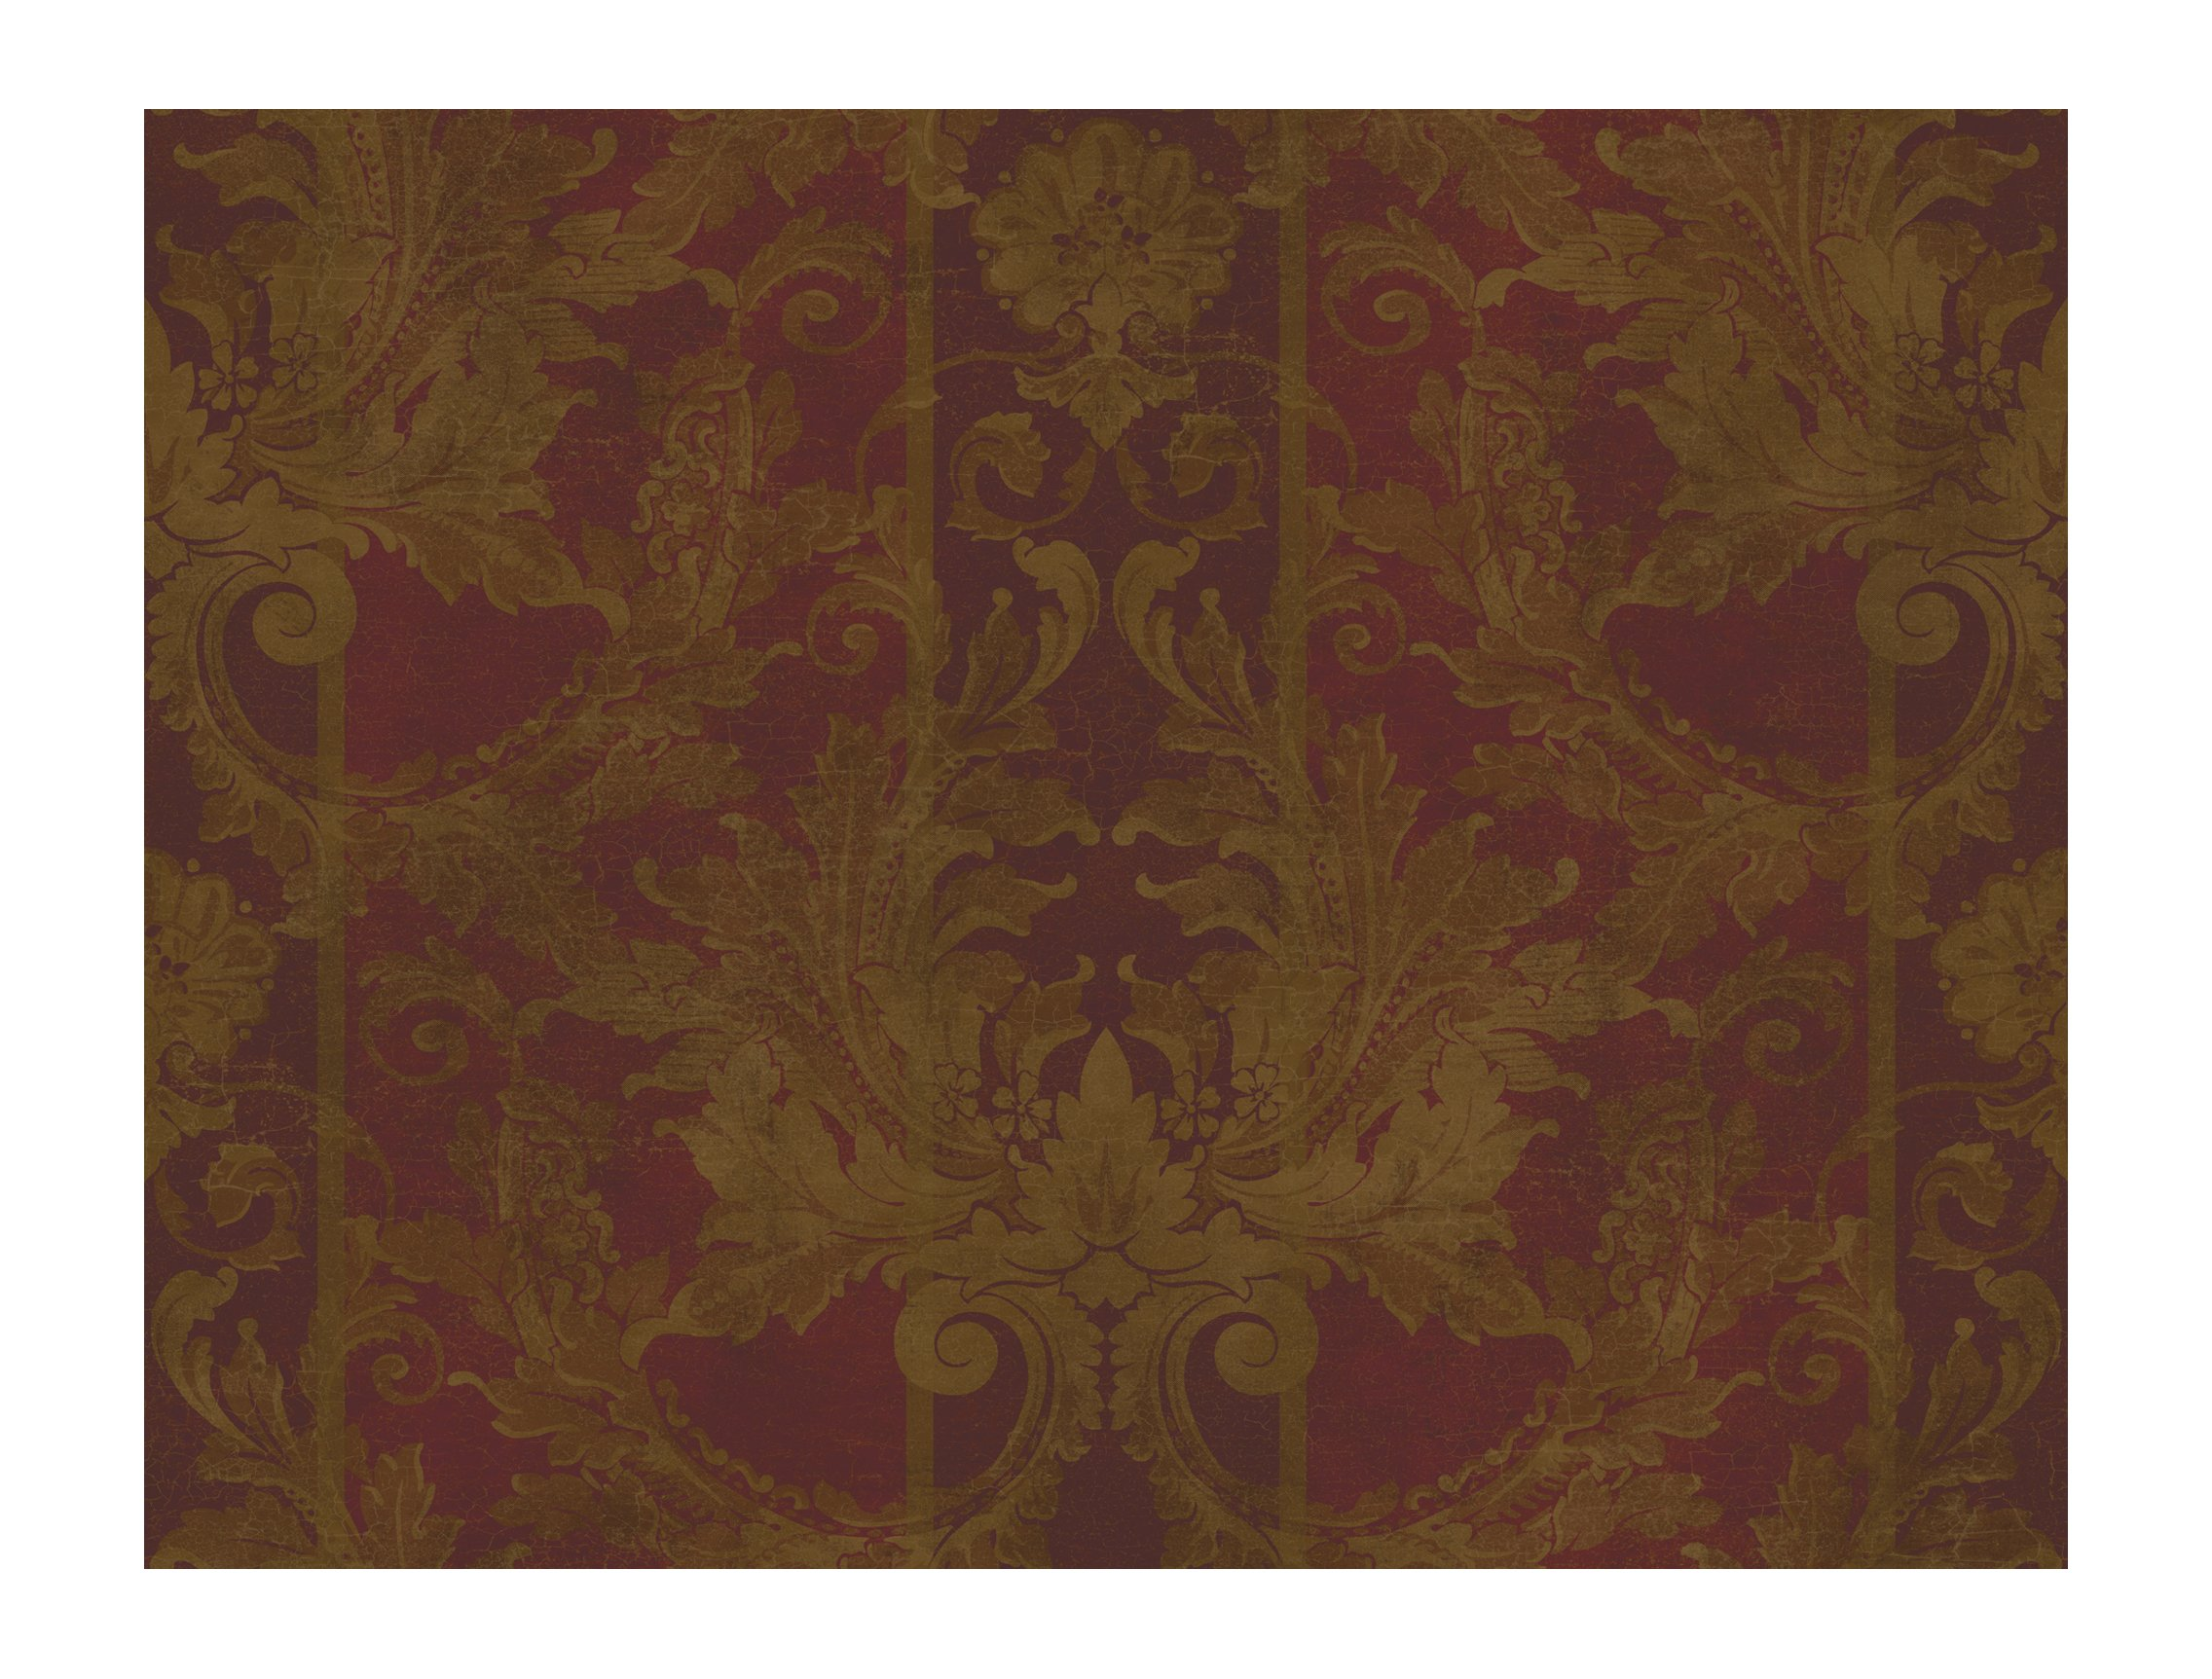 York Wallcoverings GL4727 Gold Leaf Aida Damask W/Stripe Wallpaper, Dark Red/Metallic Gold/Dark Bronze